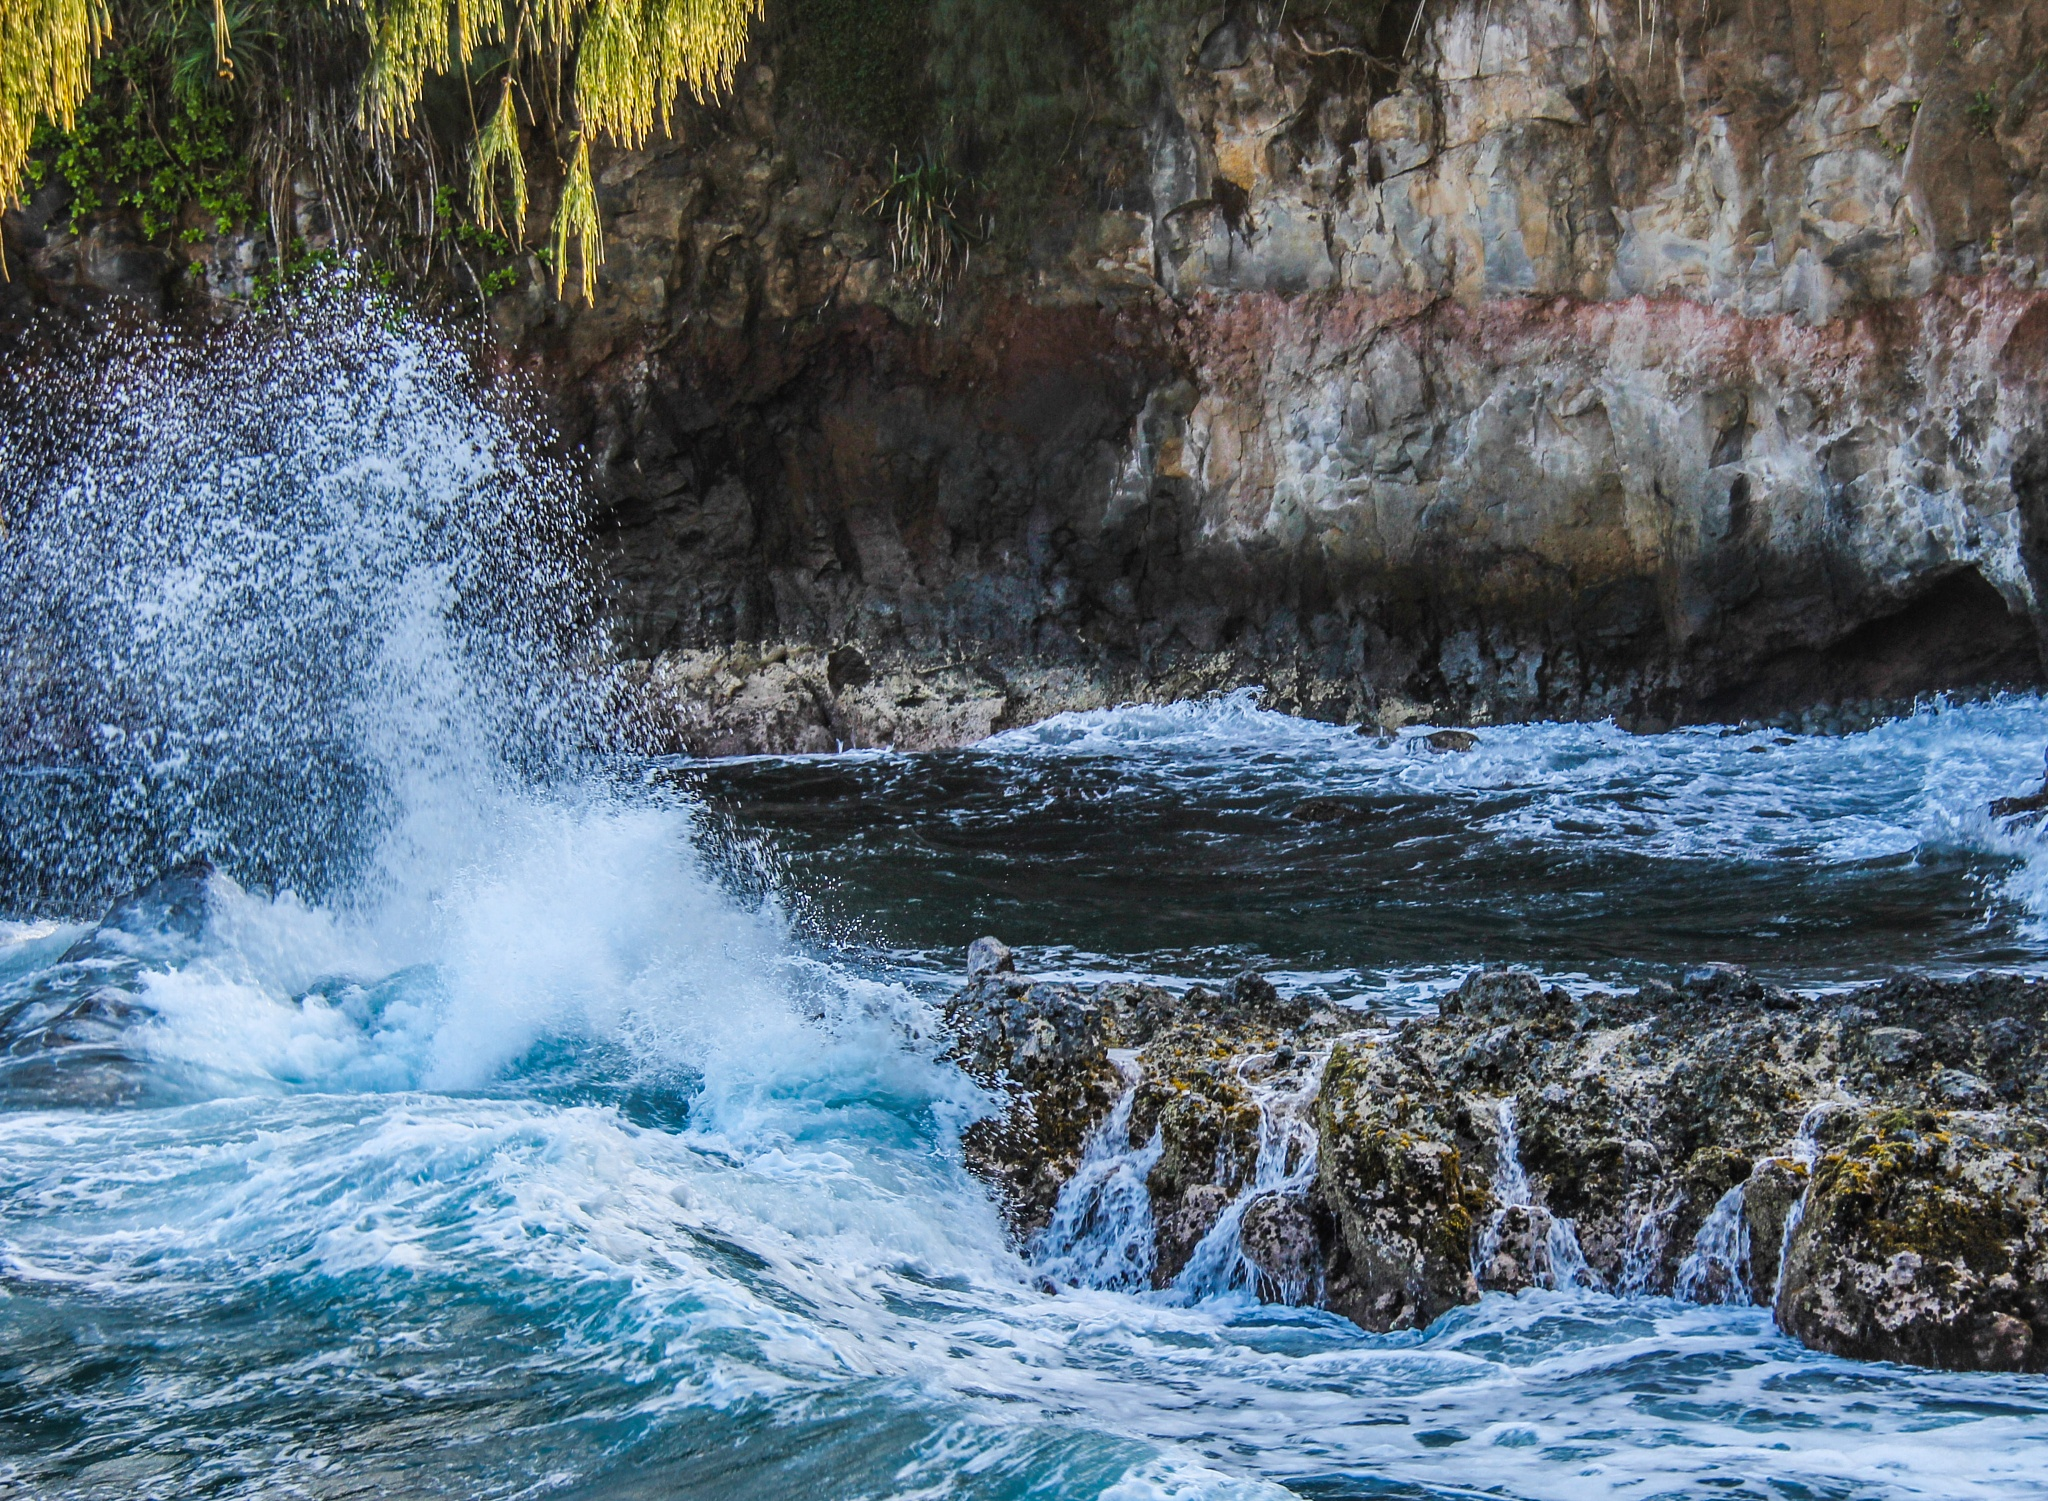 Waves and the rocks by Ryan Farahani